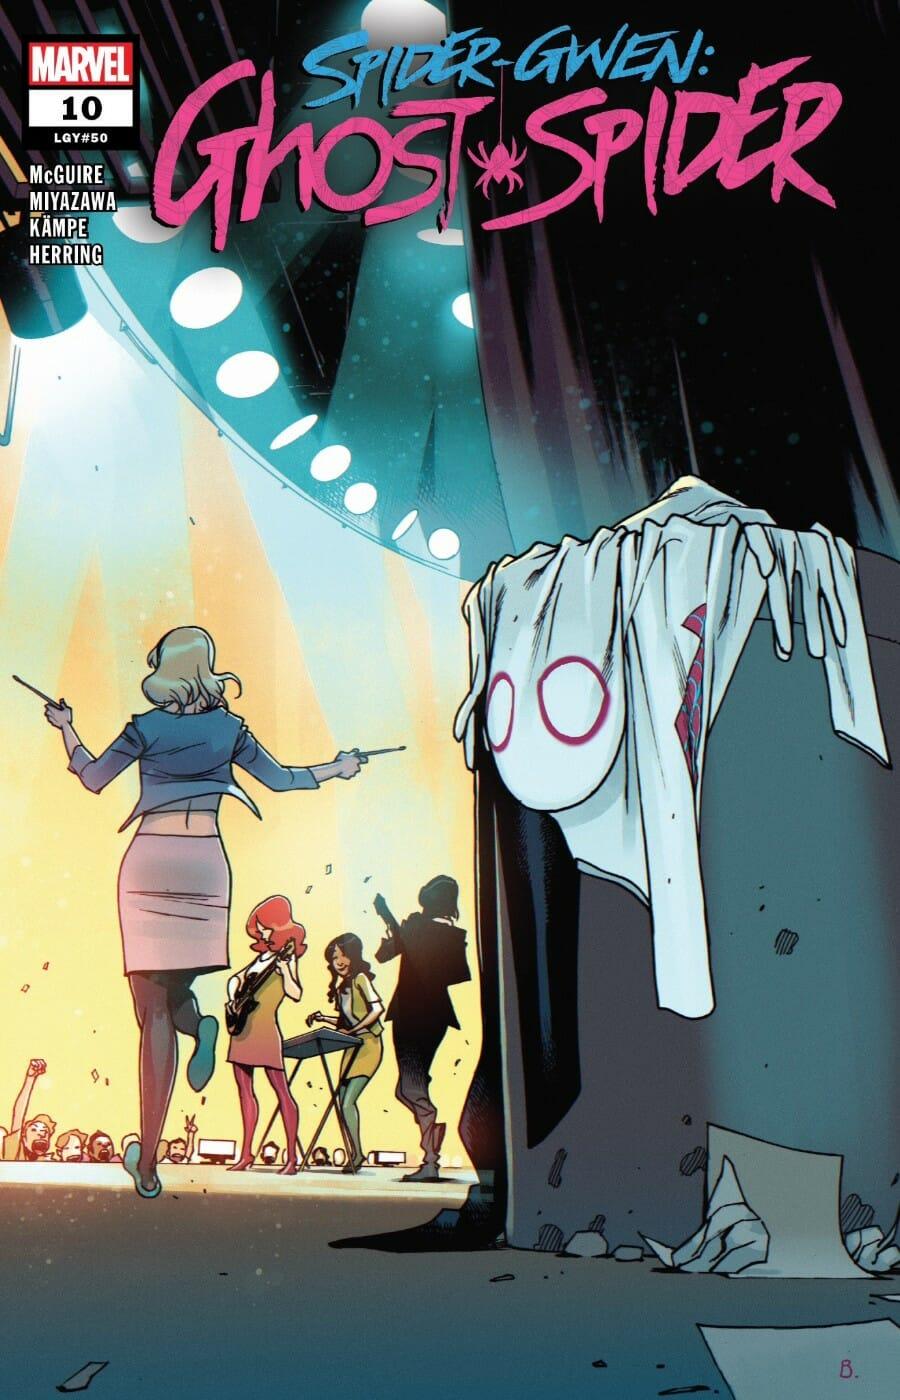 Leer Spider-Gwen: Ghost-Spider Online en Español